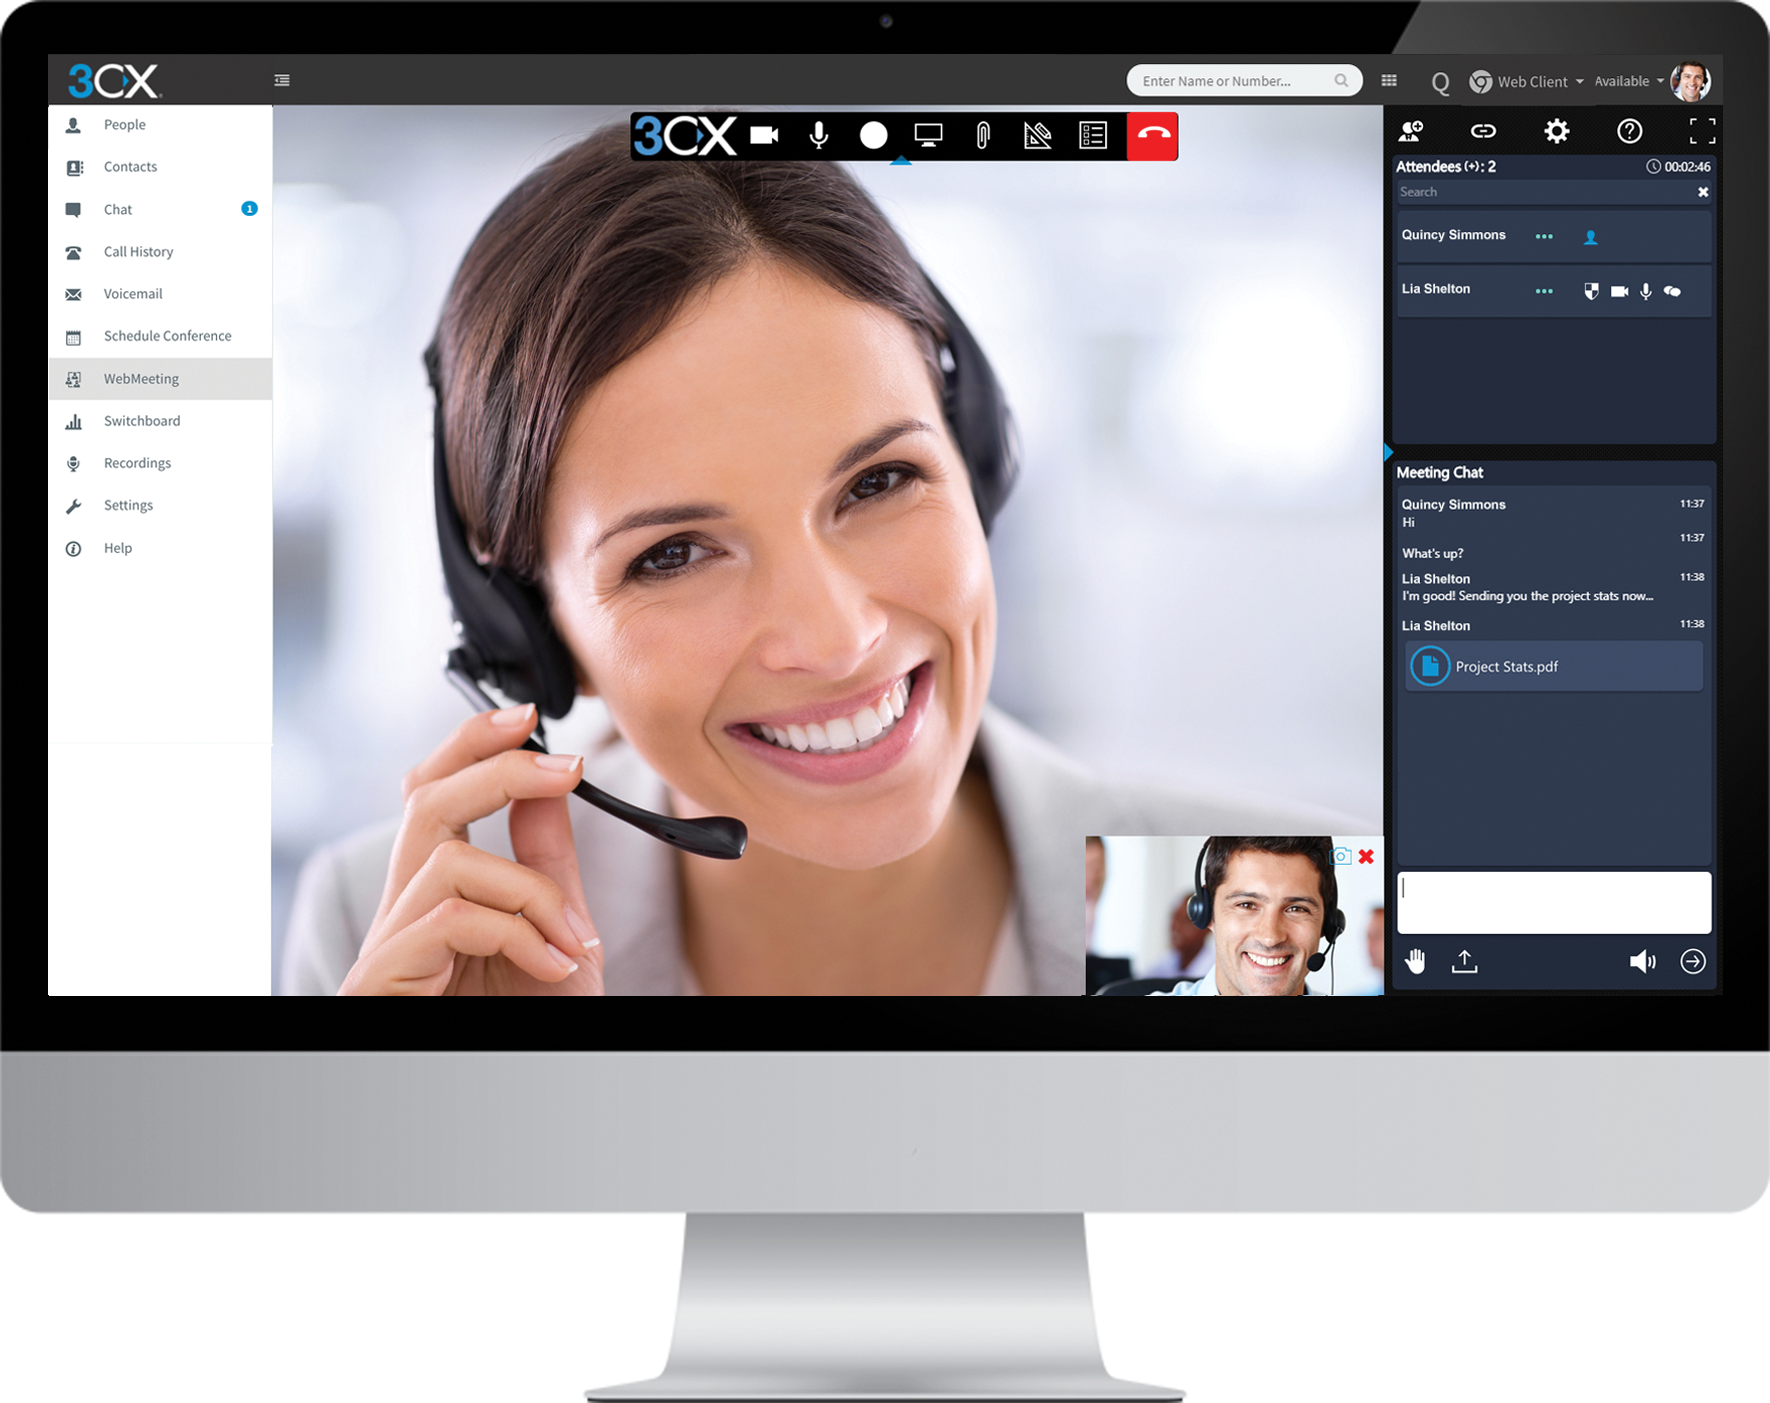 3CX Software - 3CX web meeting